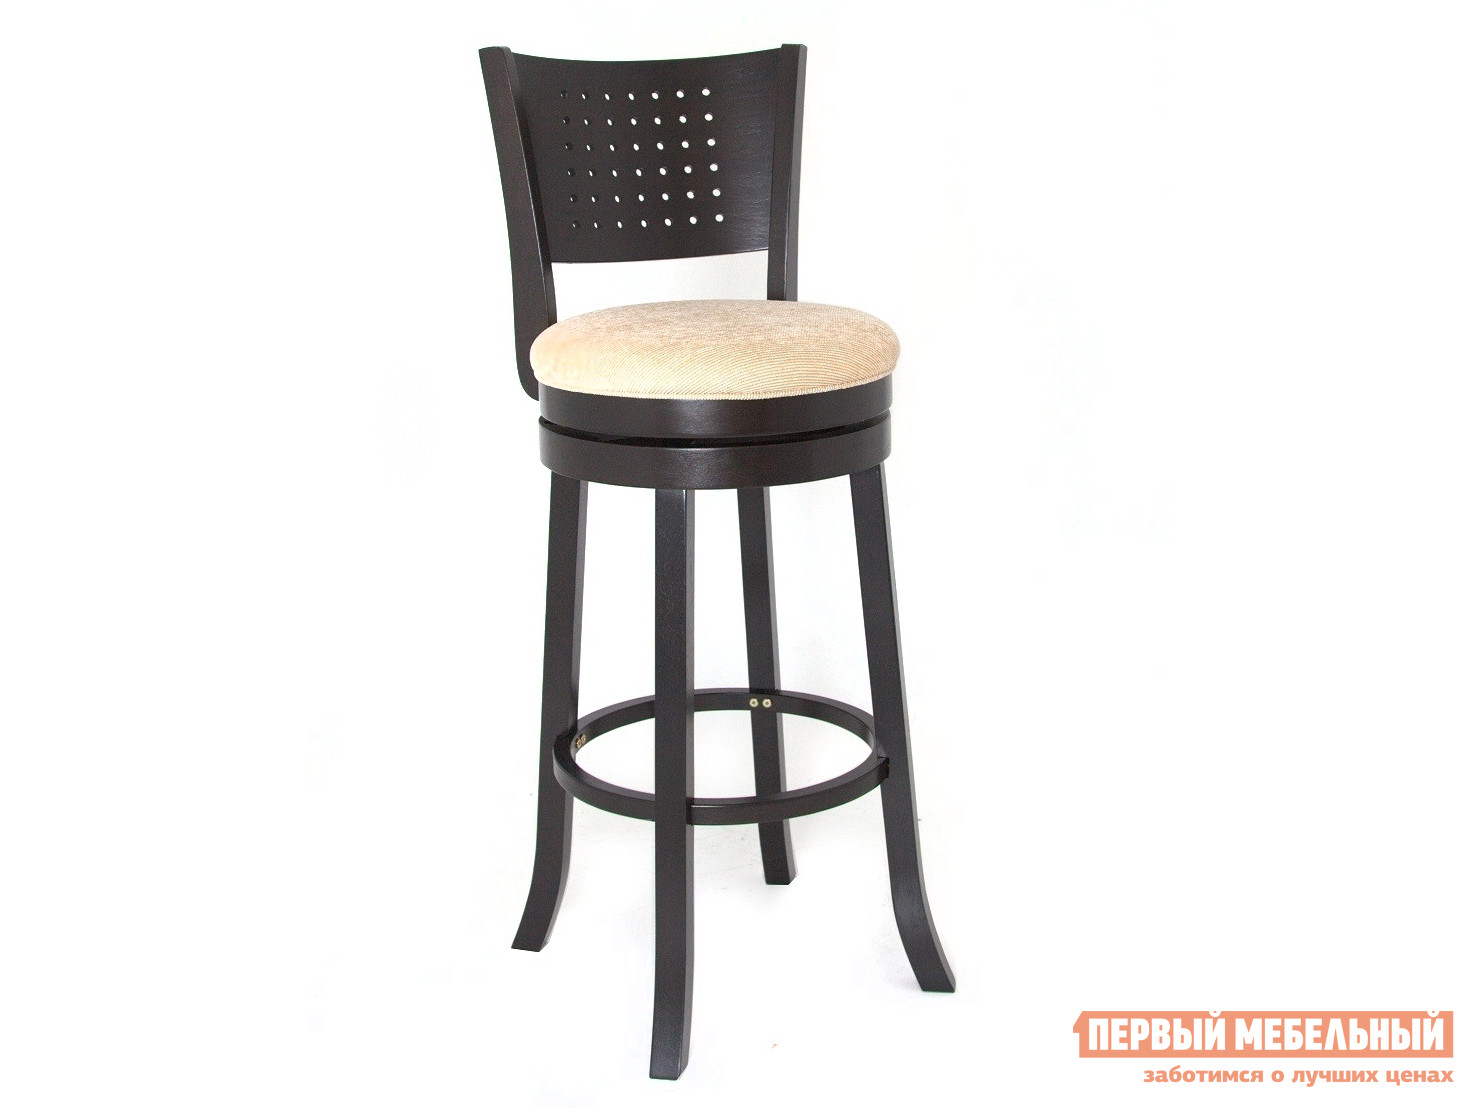 Барный стул Red and Black 299161 Барный крутящийся стул retro style polarized sunglasses with sand black frame and red lenses